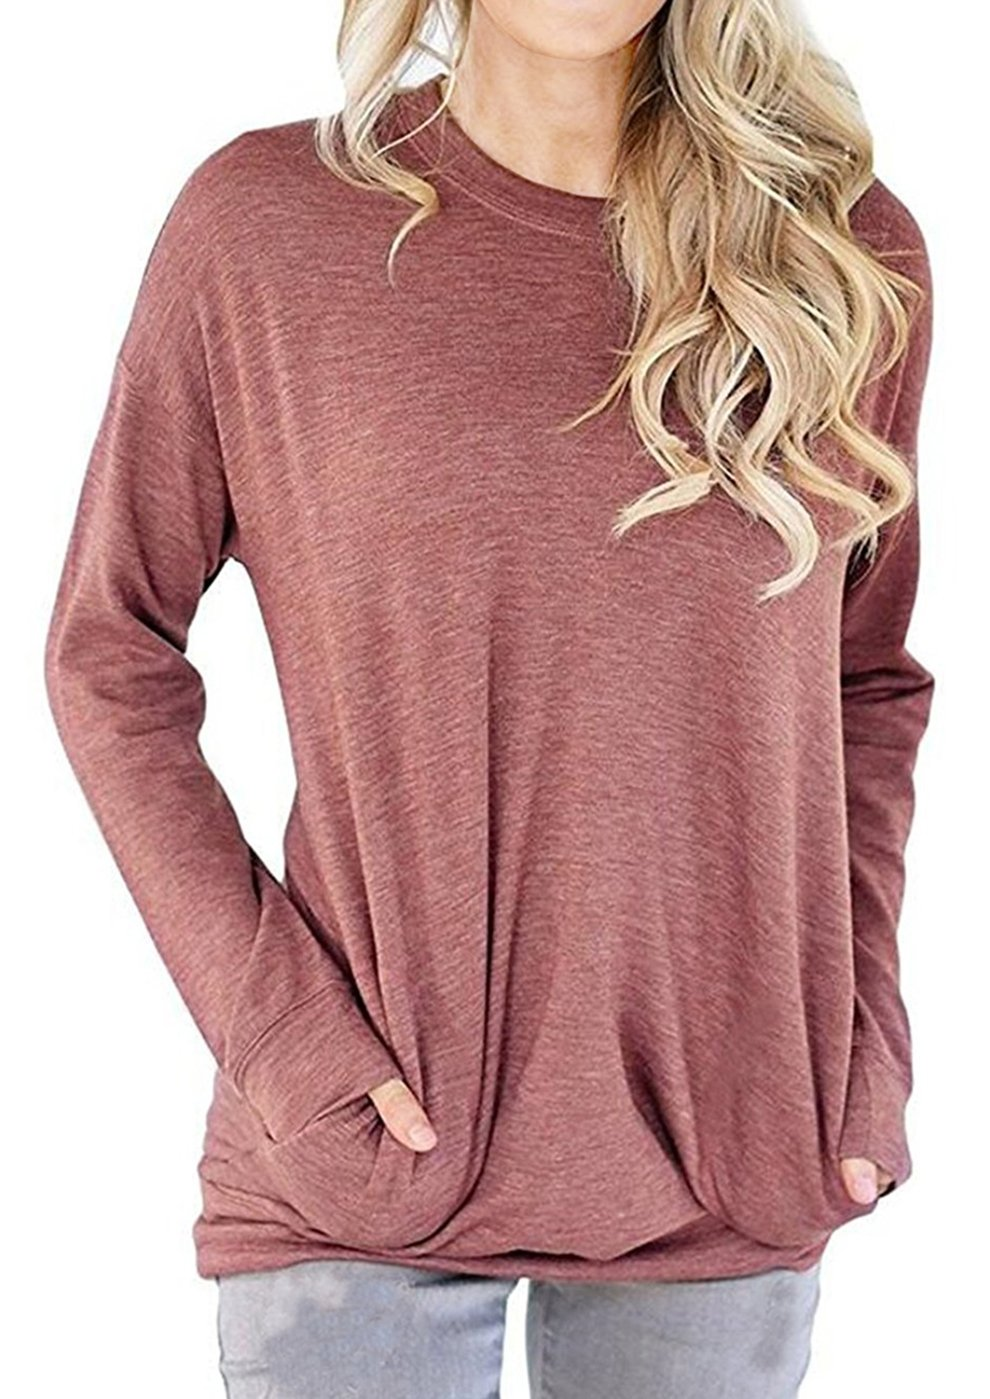 GSVIBK Women Casual Round Neck Sweatshirts Long Sleeve Pullover Shirts Tops Soft Sweatshirts Blouse Pocket Light Red 3XL